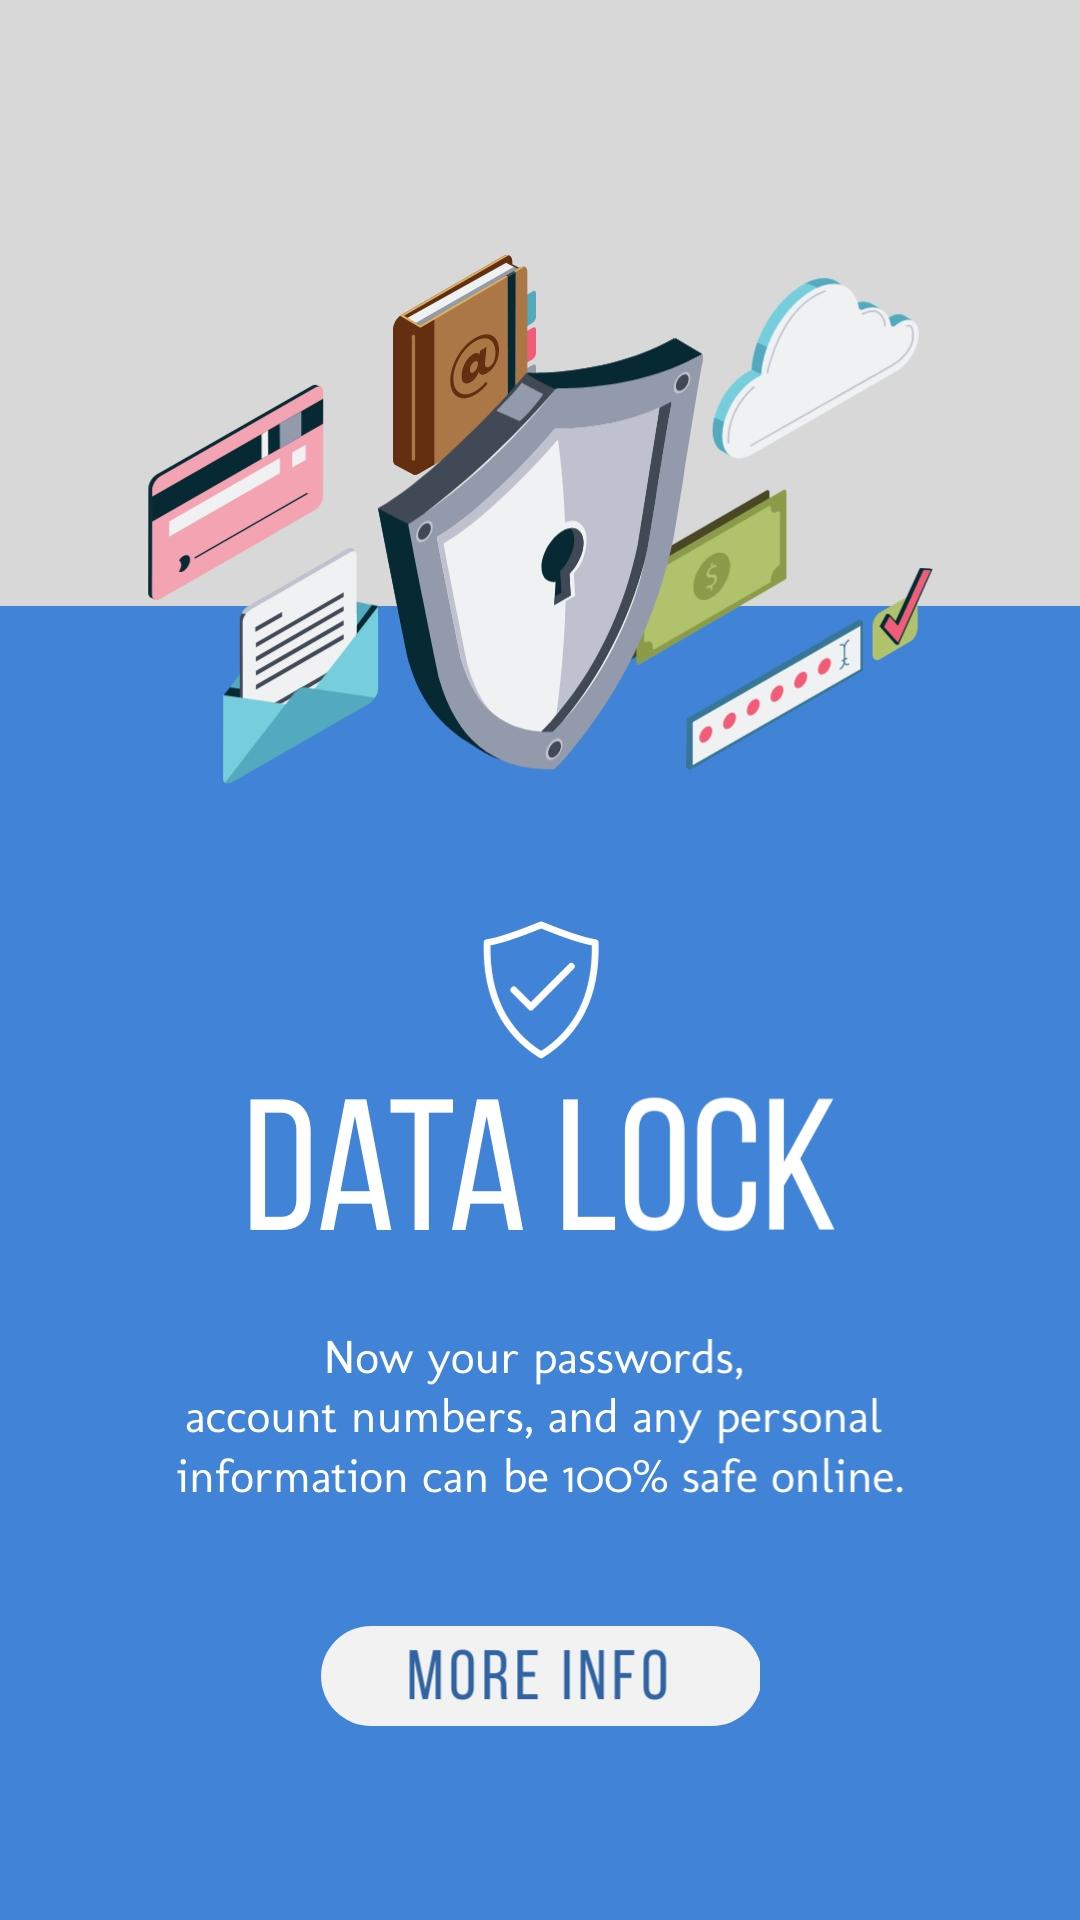 Data Lock Vertical Template